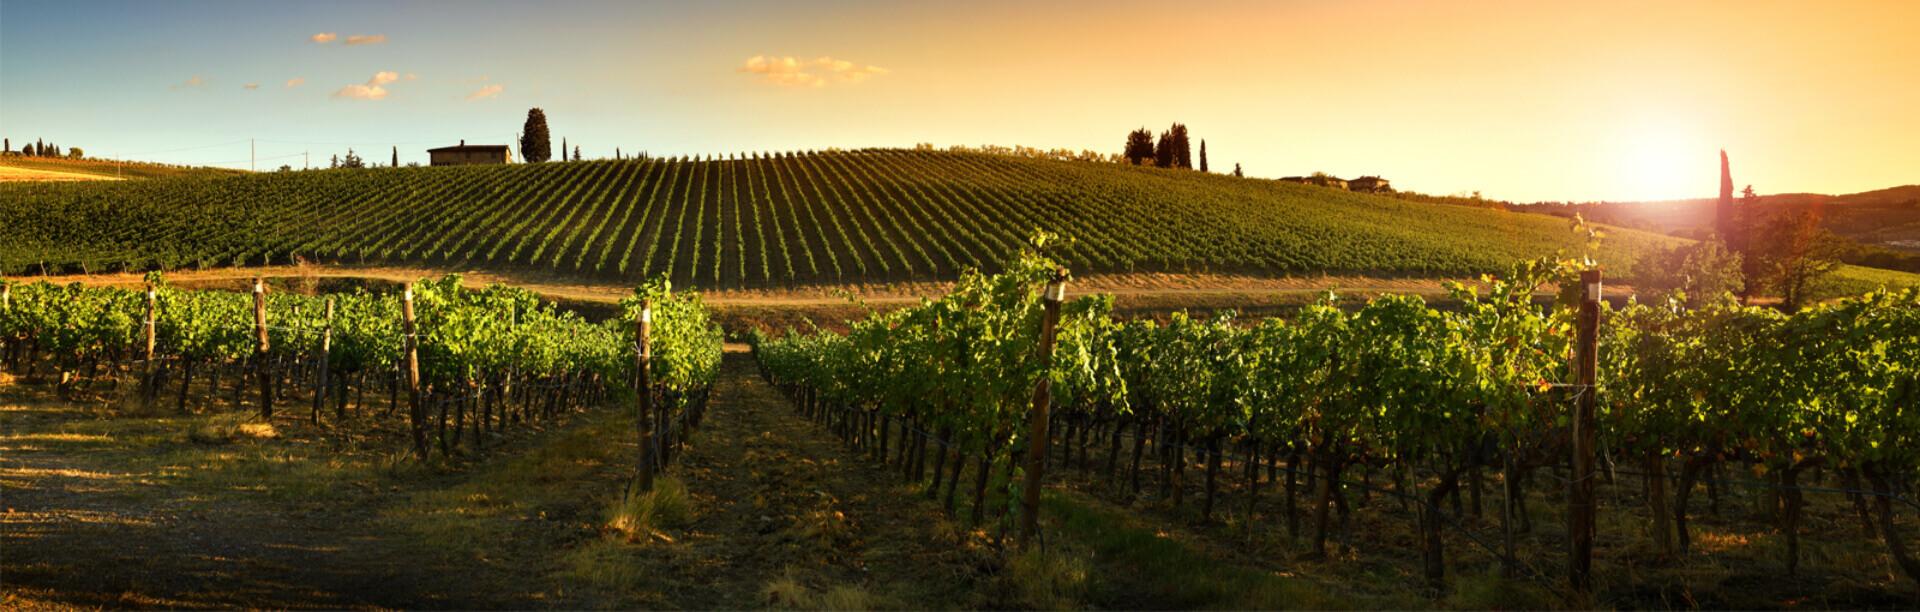 Prosit - Vino dall'eccellenza italiana